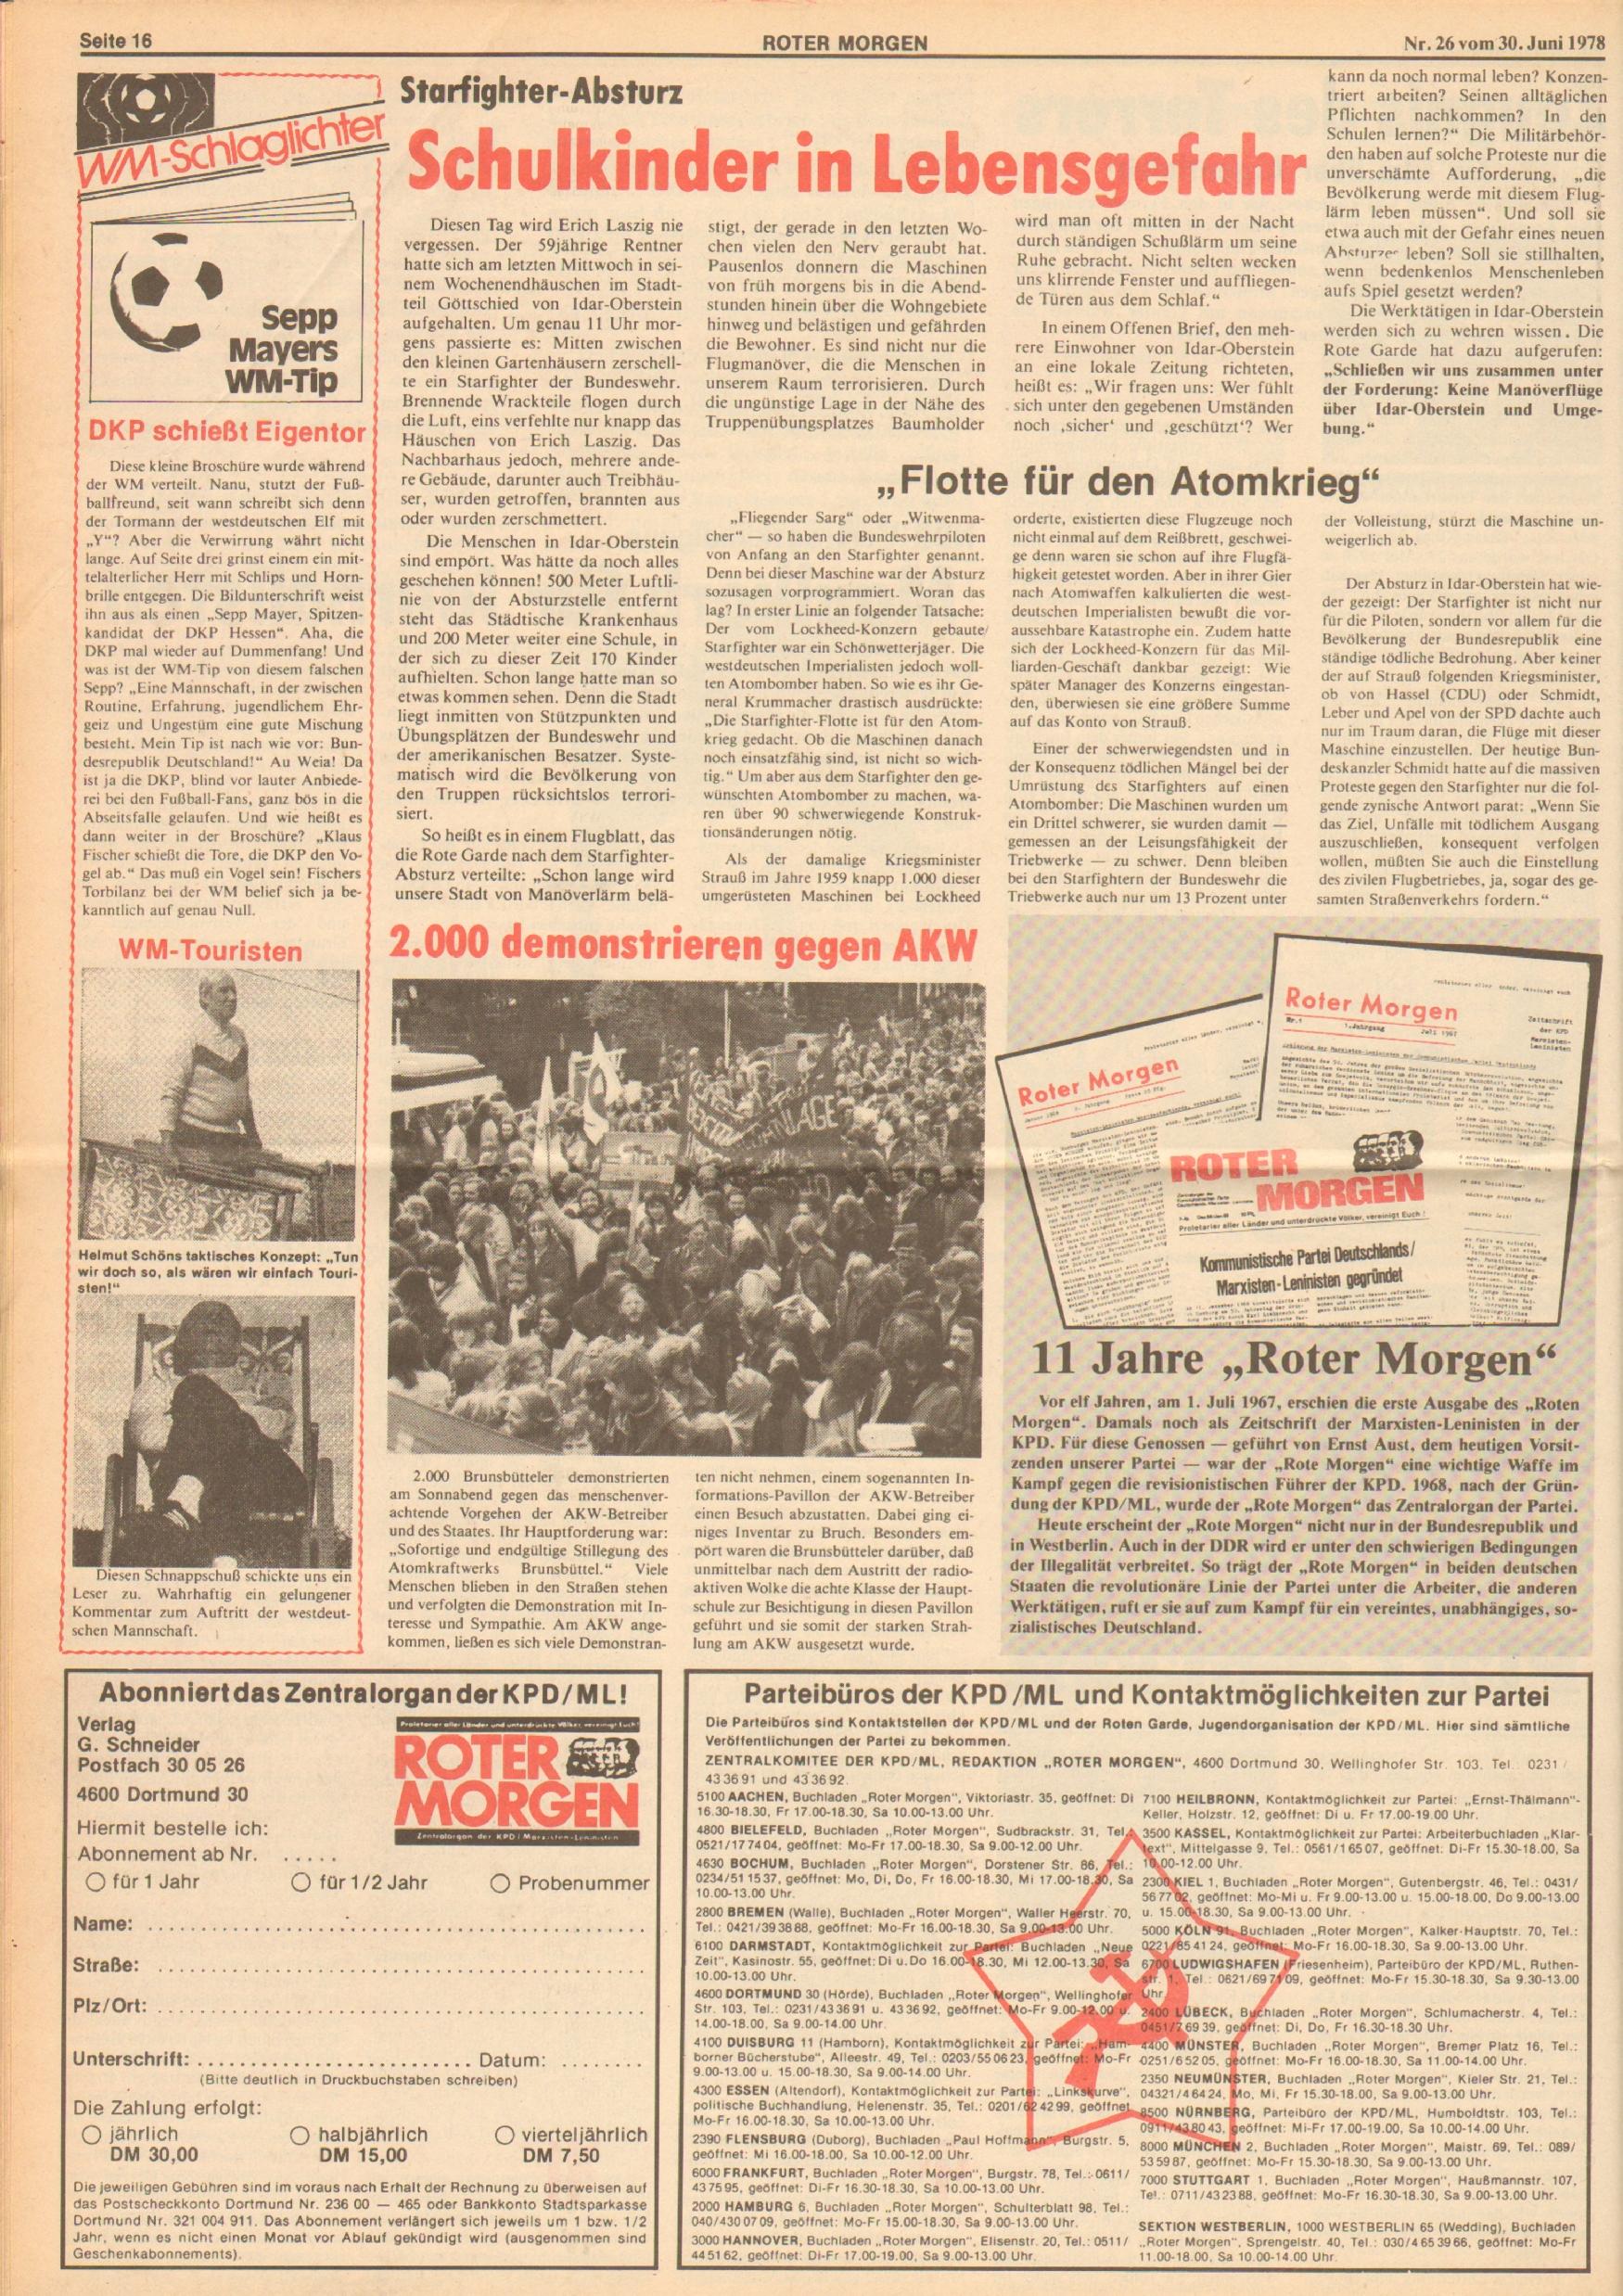 Roter Morgen, 12. Jg., 30. Juni 1978, Nr. 26, Seite 16